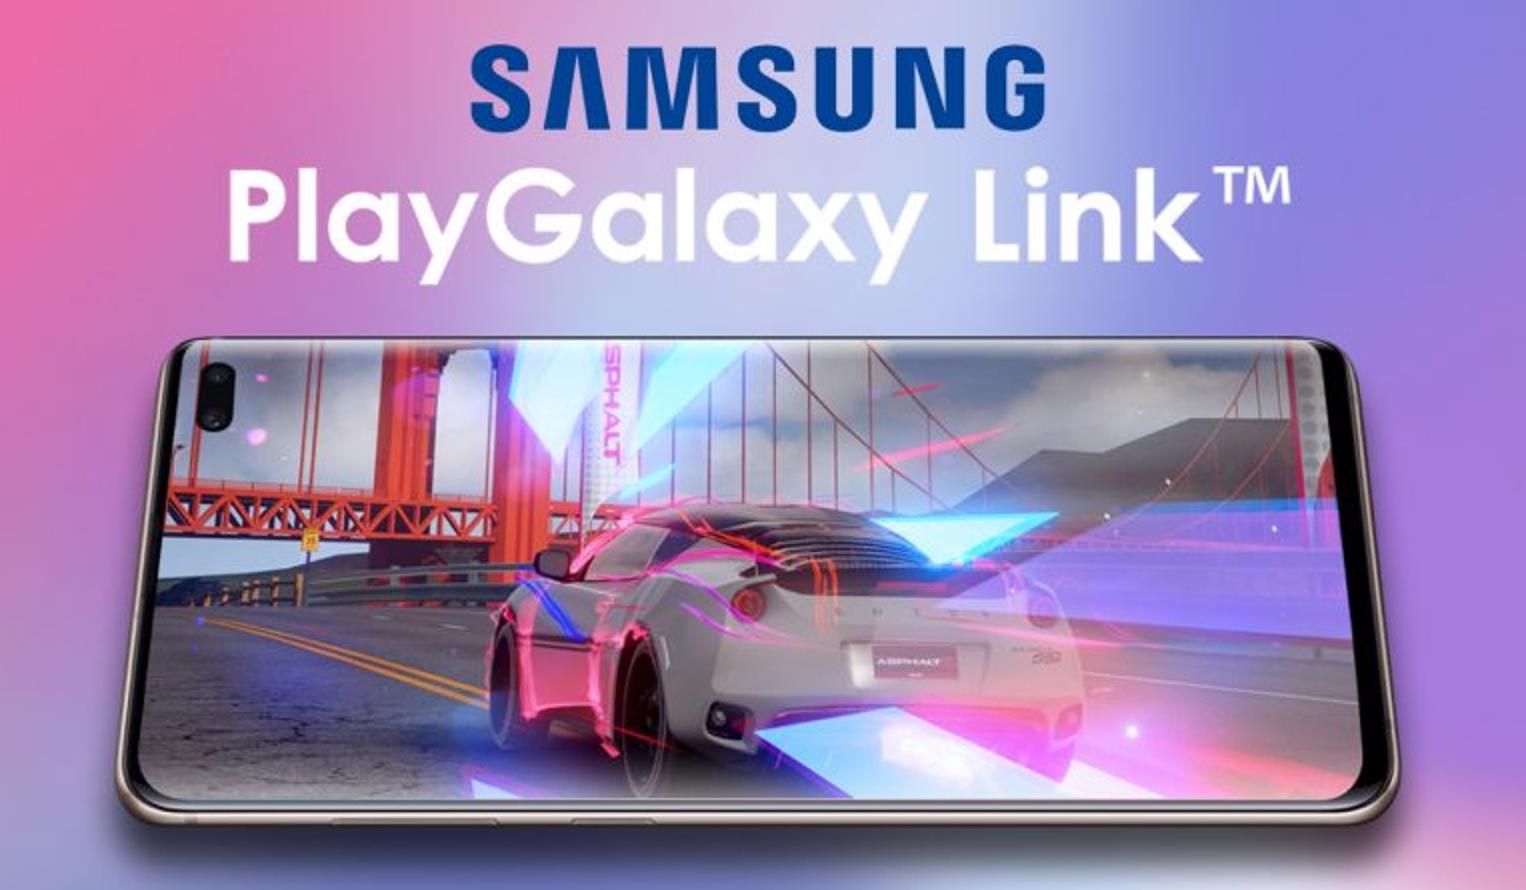 samsung galaxyplay link